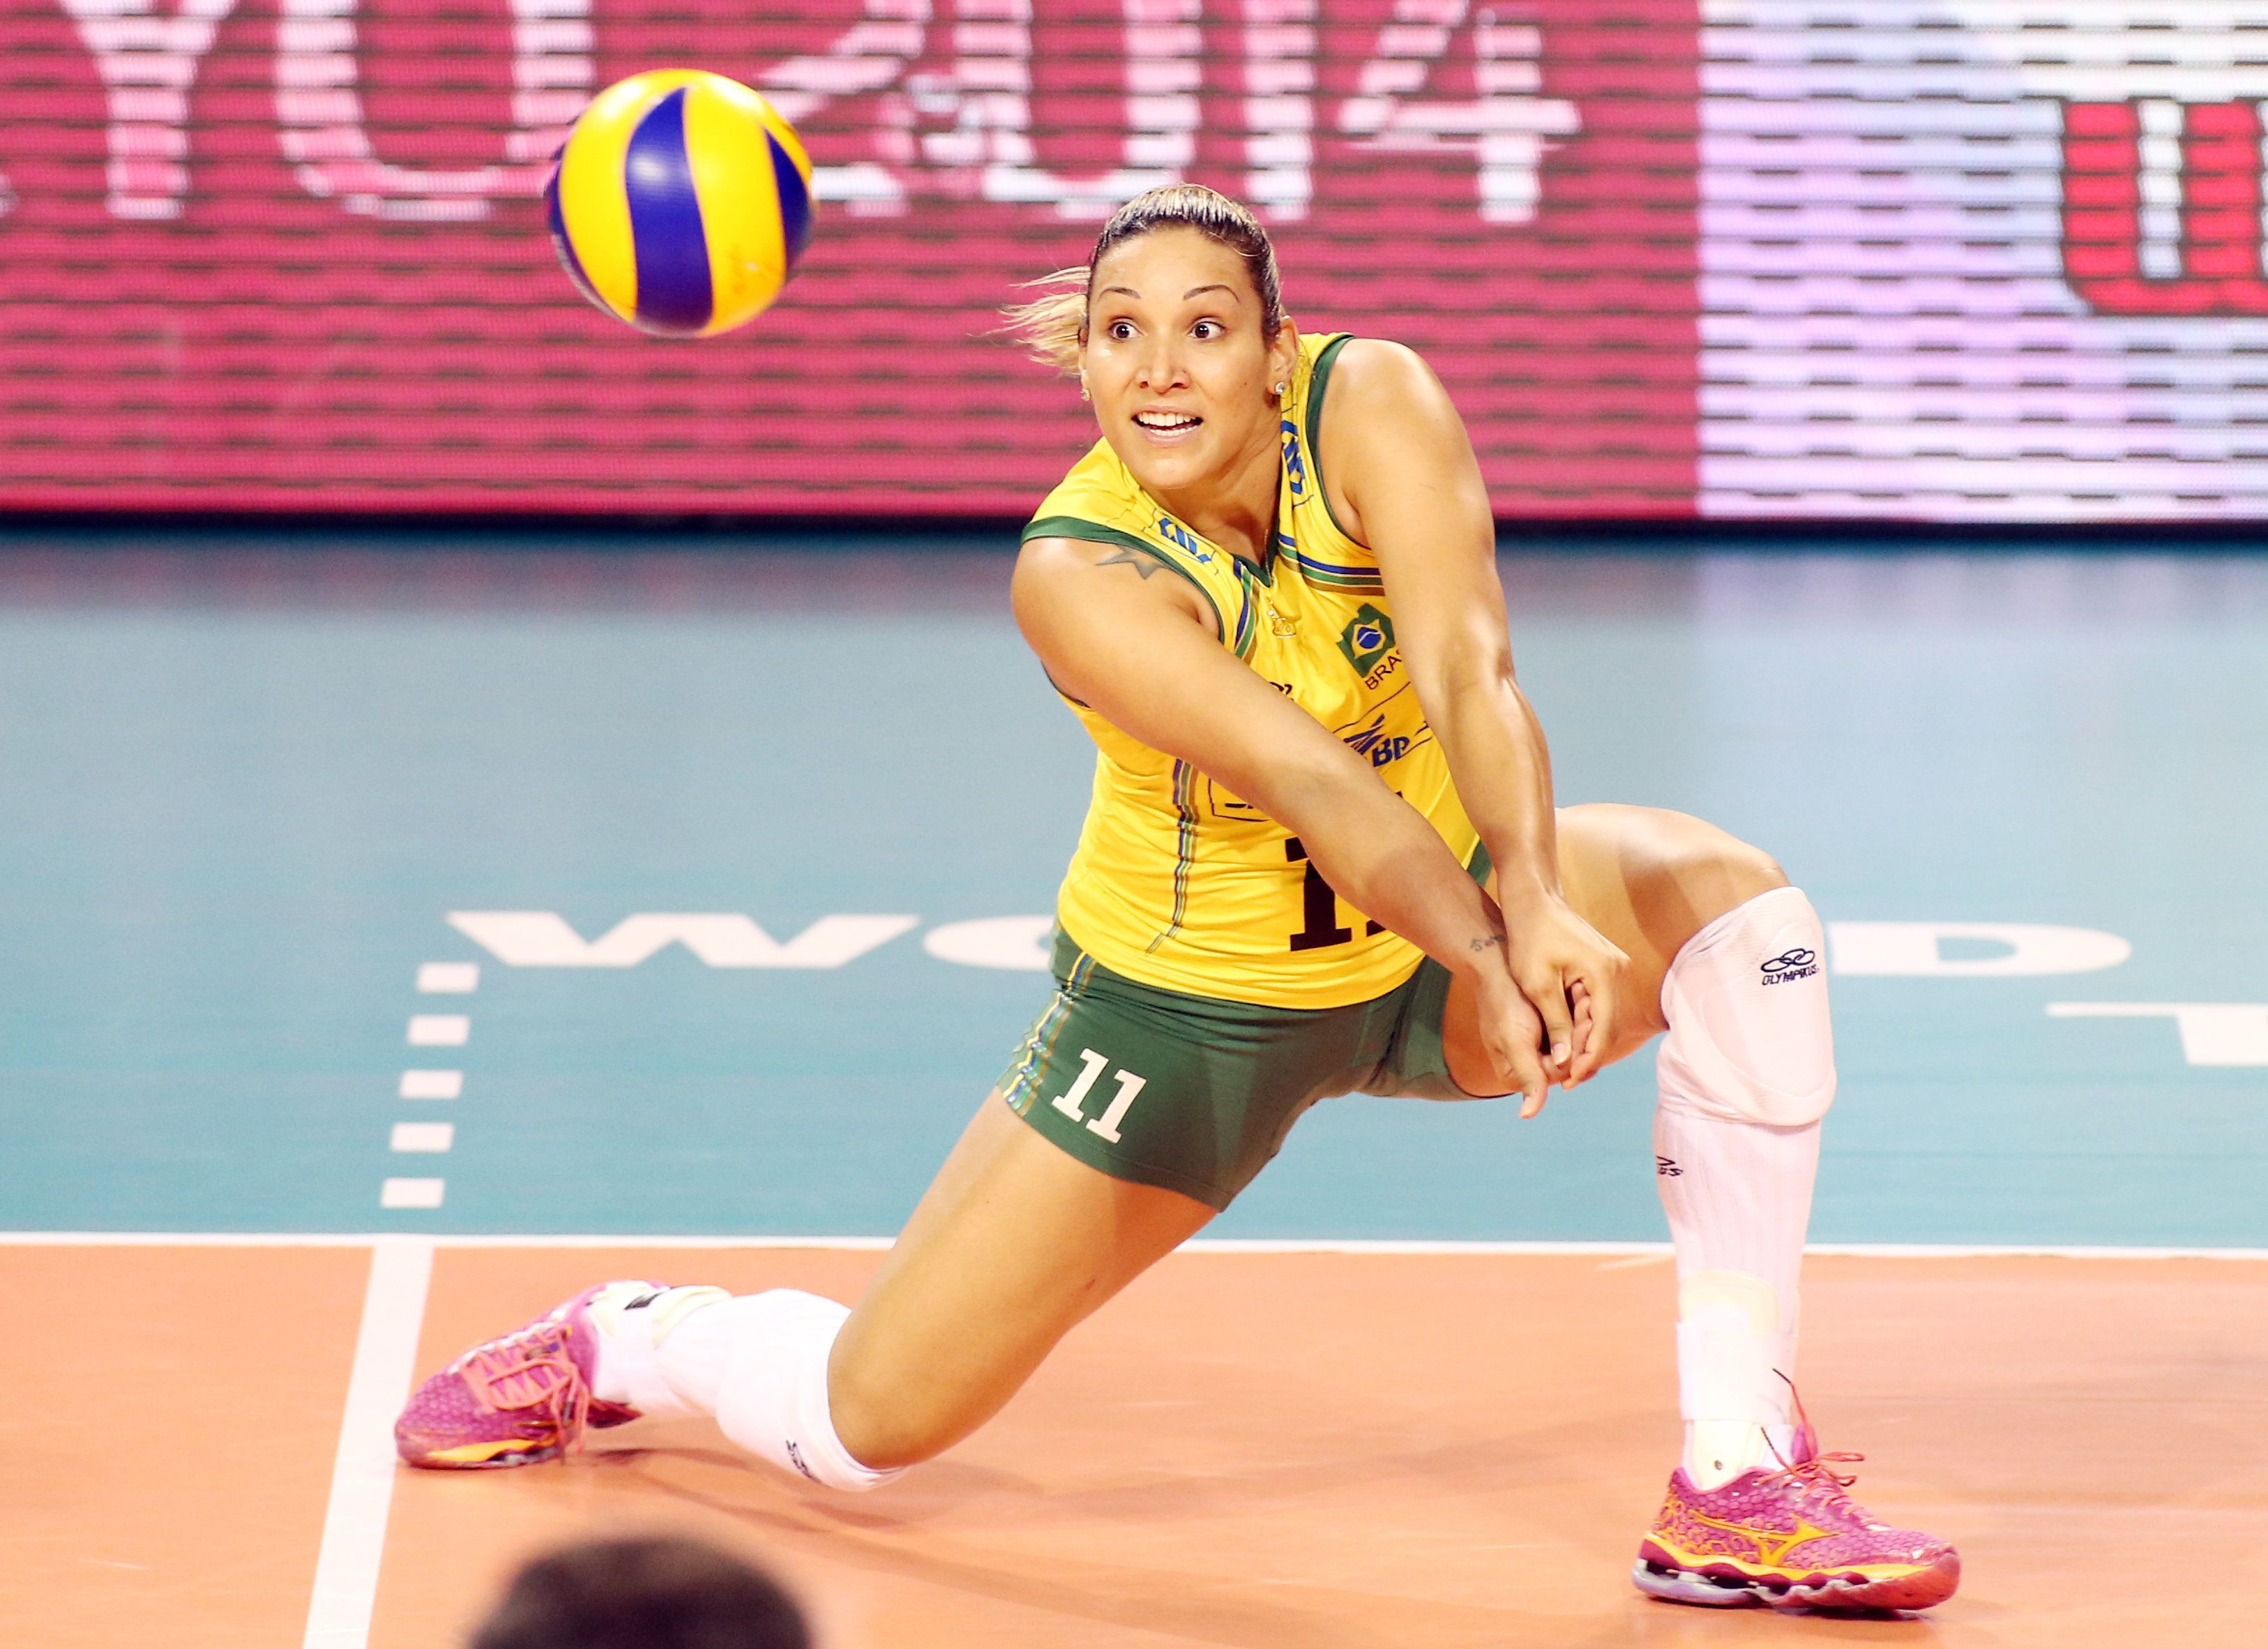 Brazil S Caixeta Tandara Receiving Female Volleyball Players Volleyball Players Volleyball